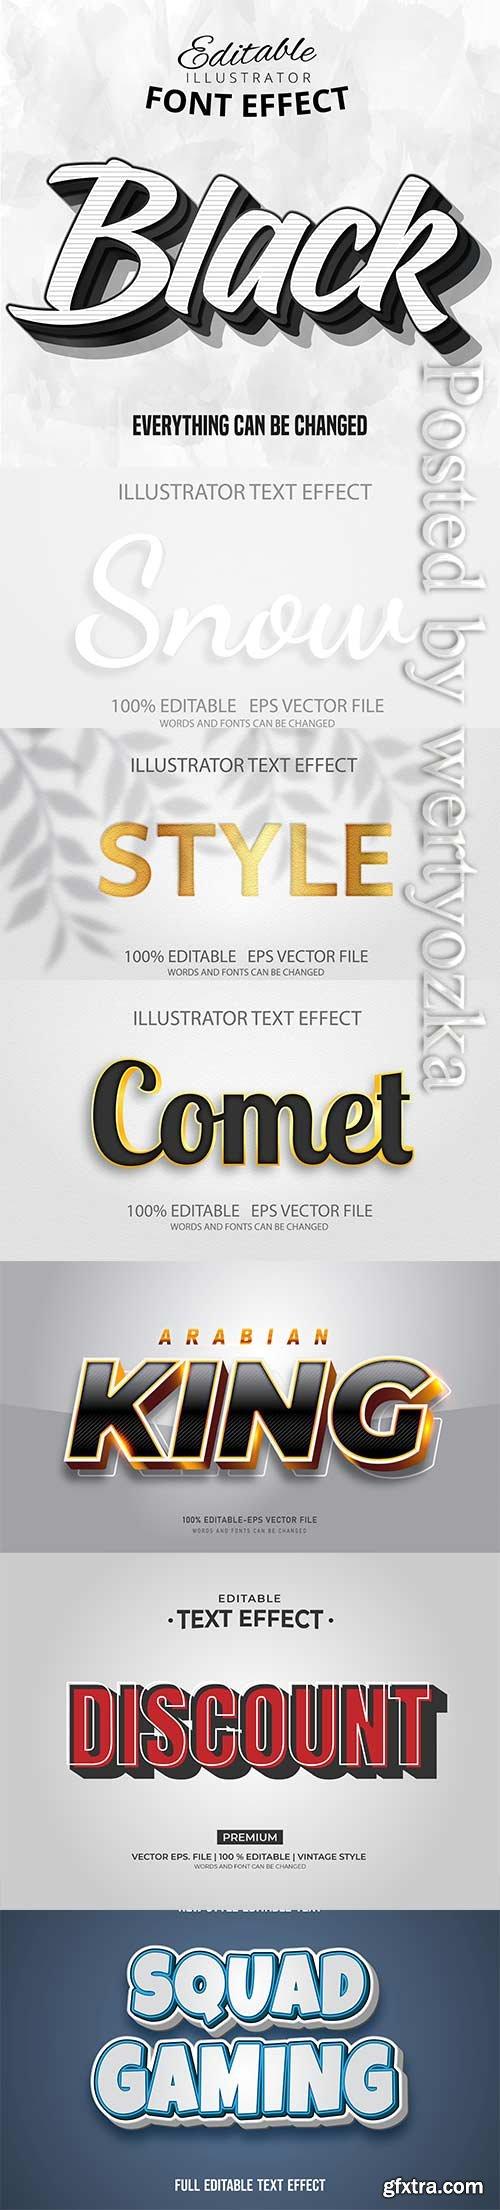 3d editable text style effect vector vol 255